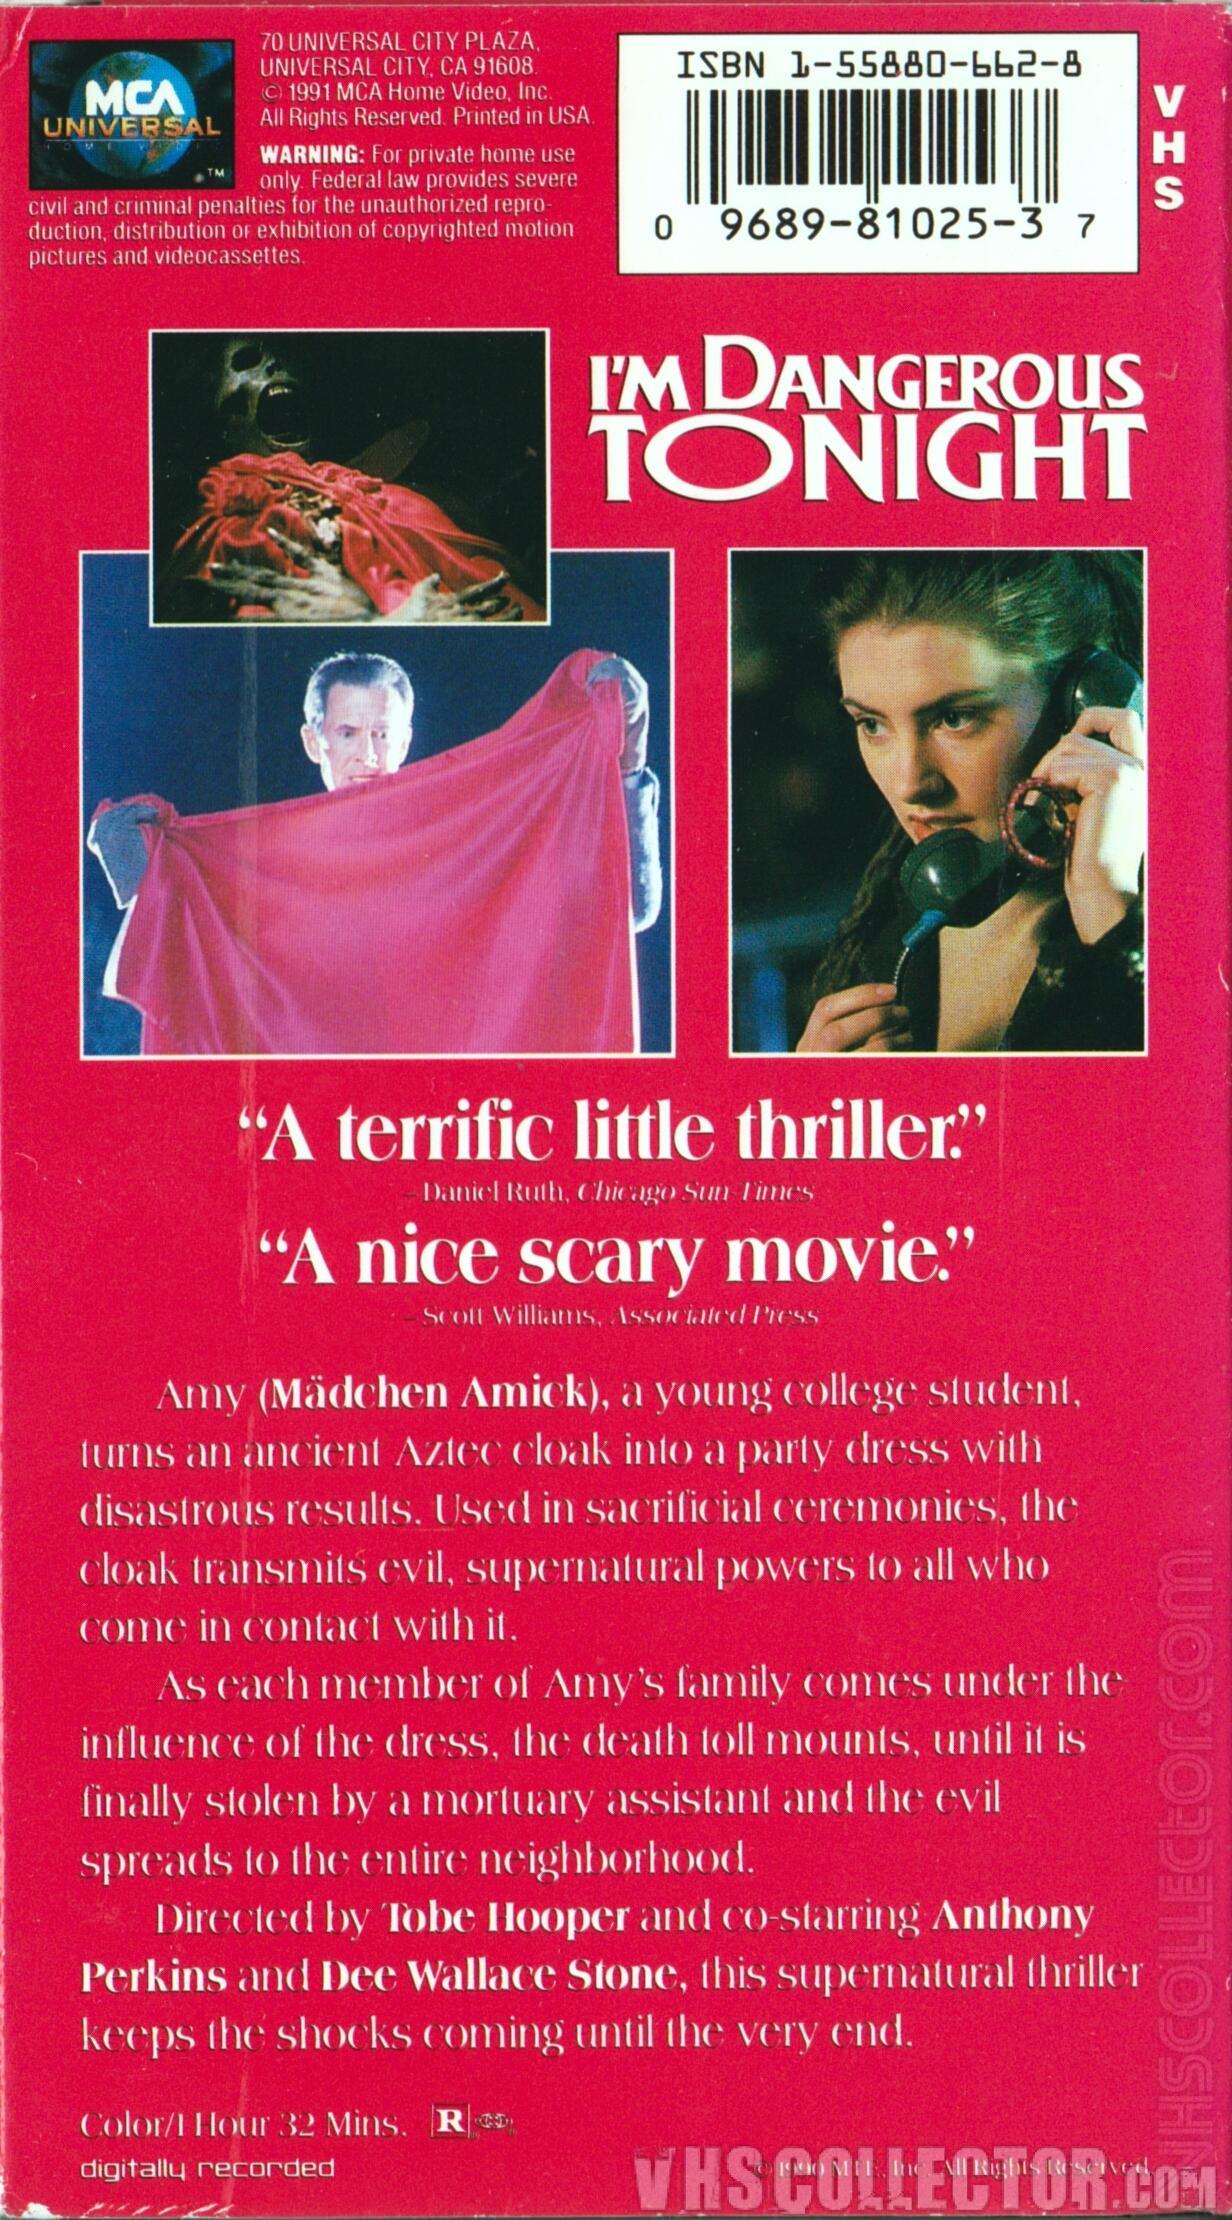 I'm Dangerous Tonight | VHSCollector.com